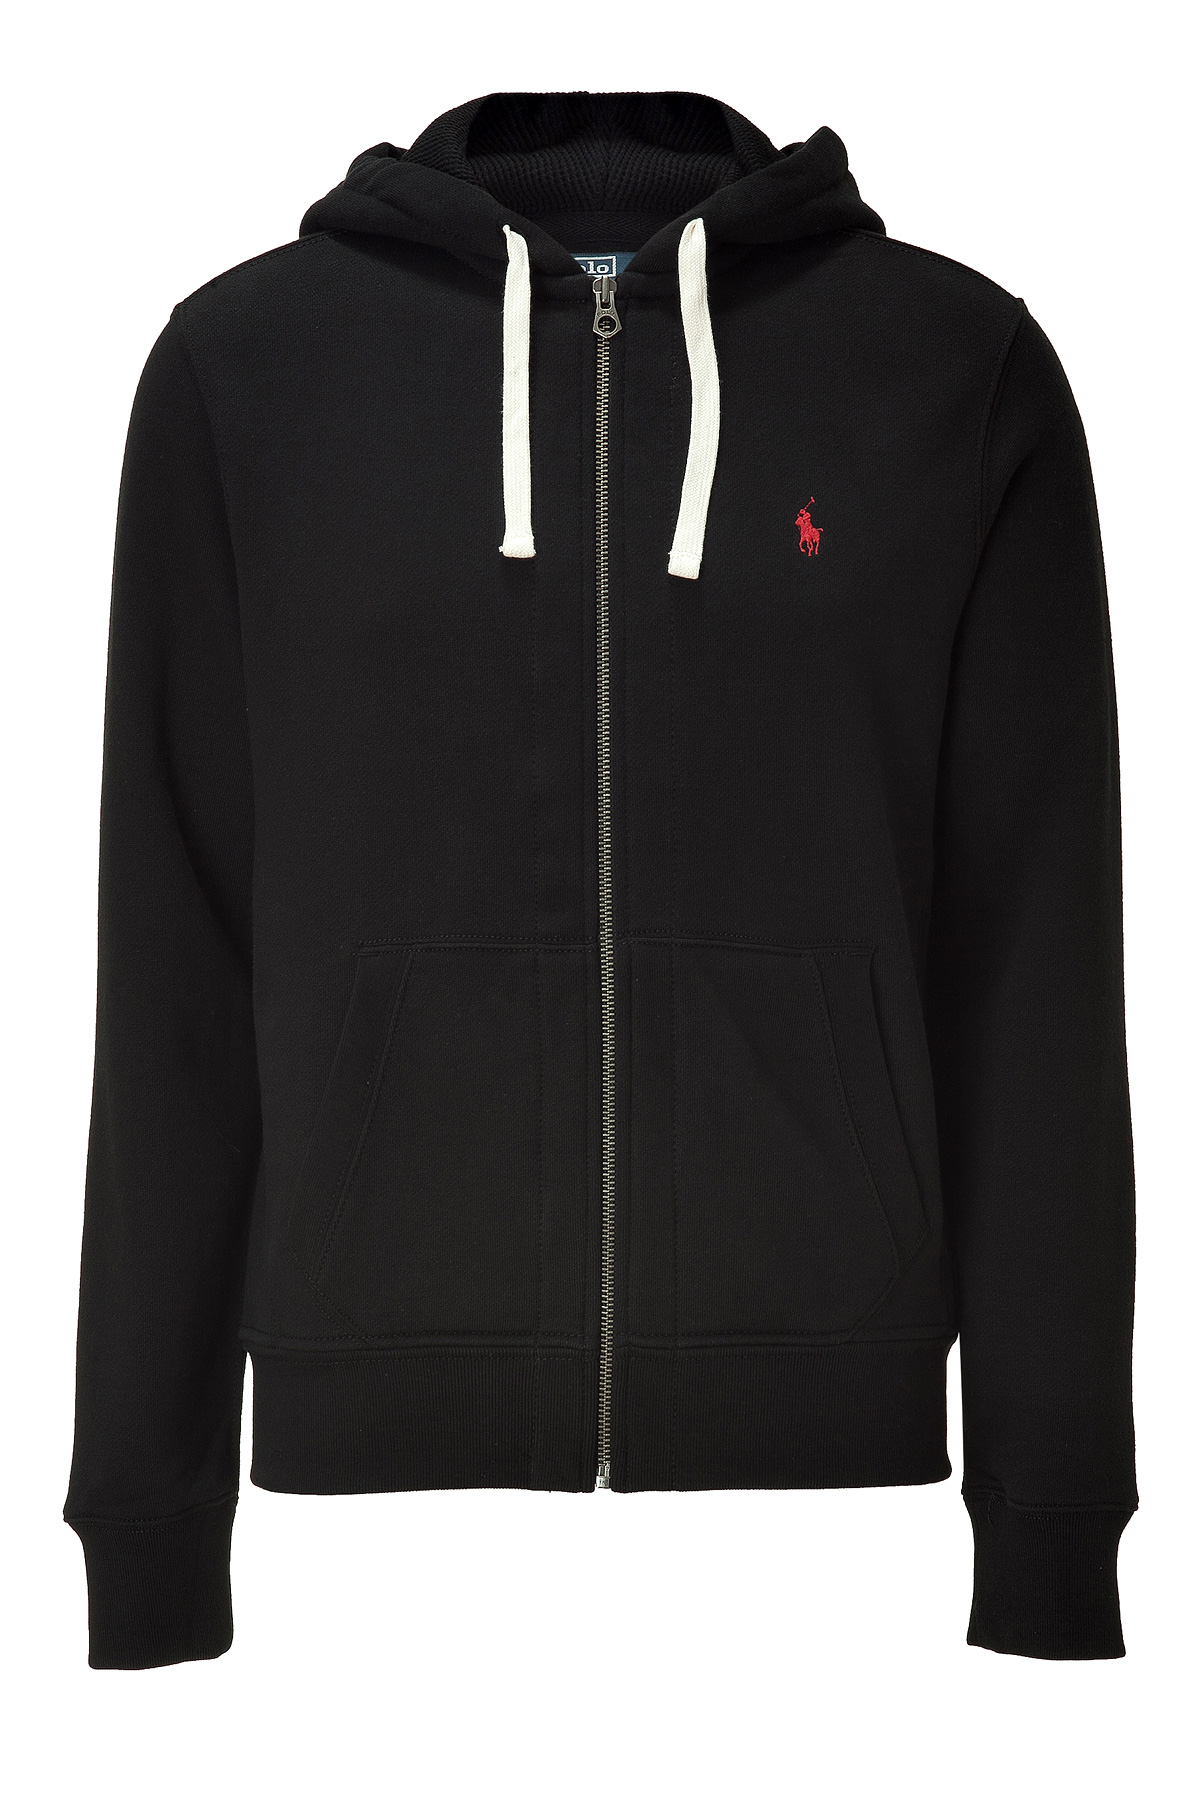 ralph lauren black classic athletic fleece hoodie in black. Black Bedroom Furniture Sets. Home Design Ideas